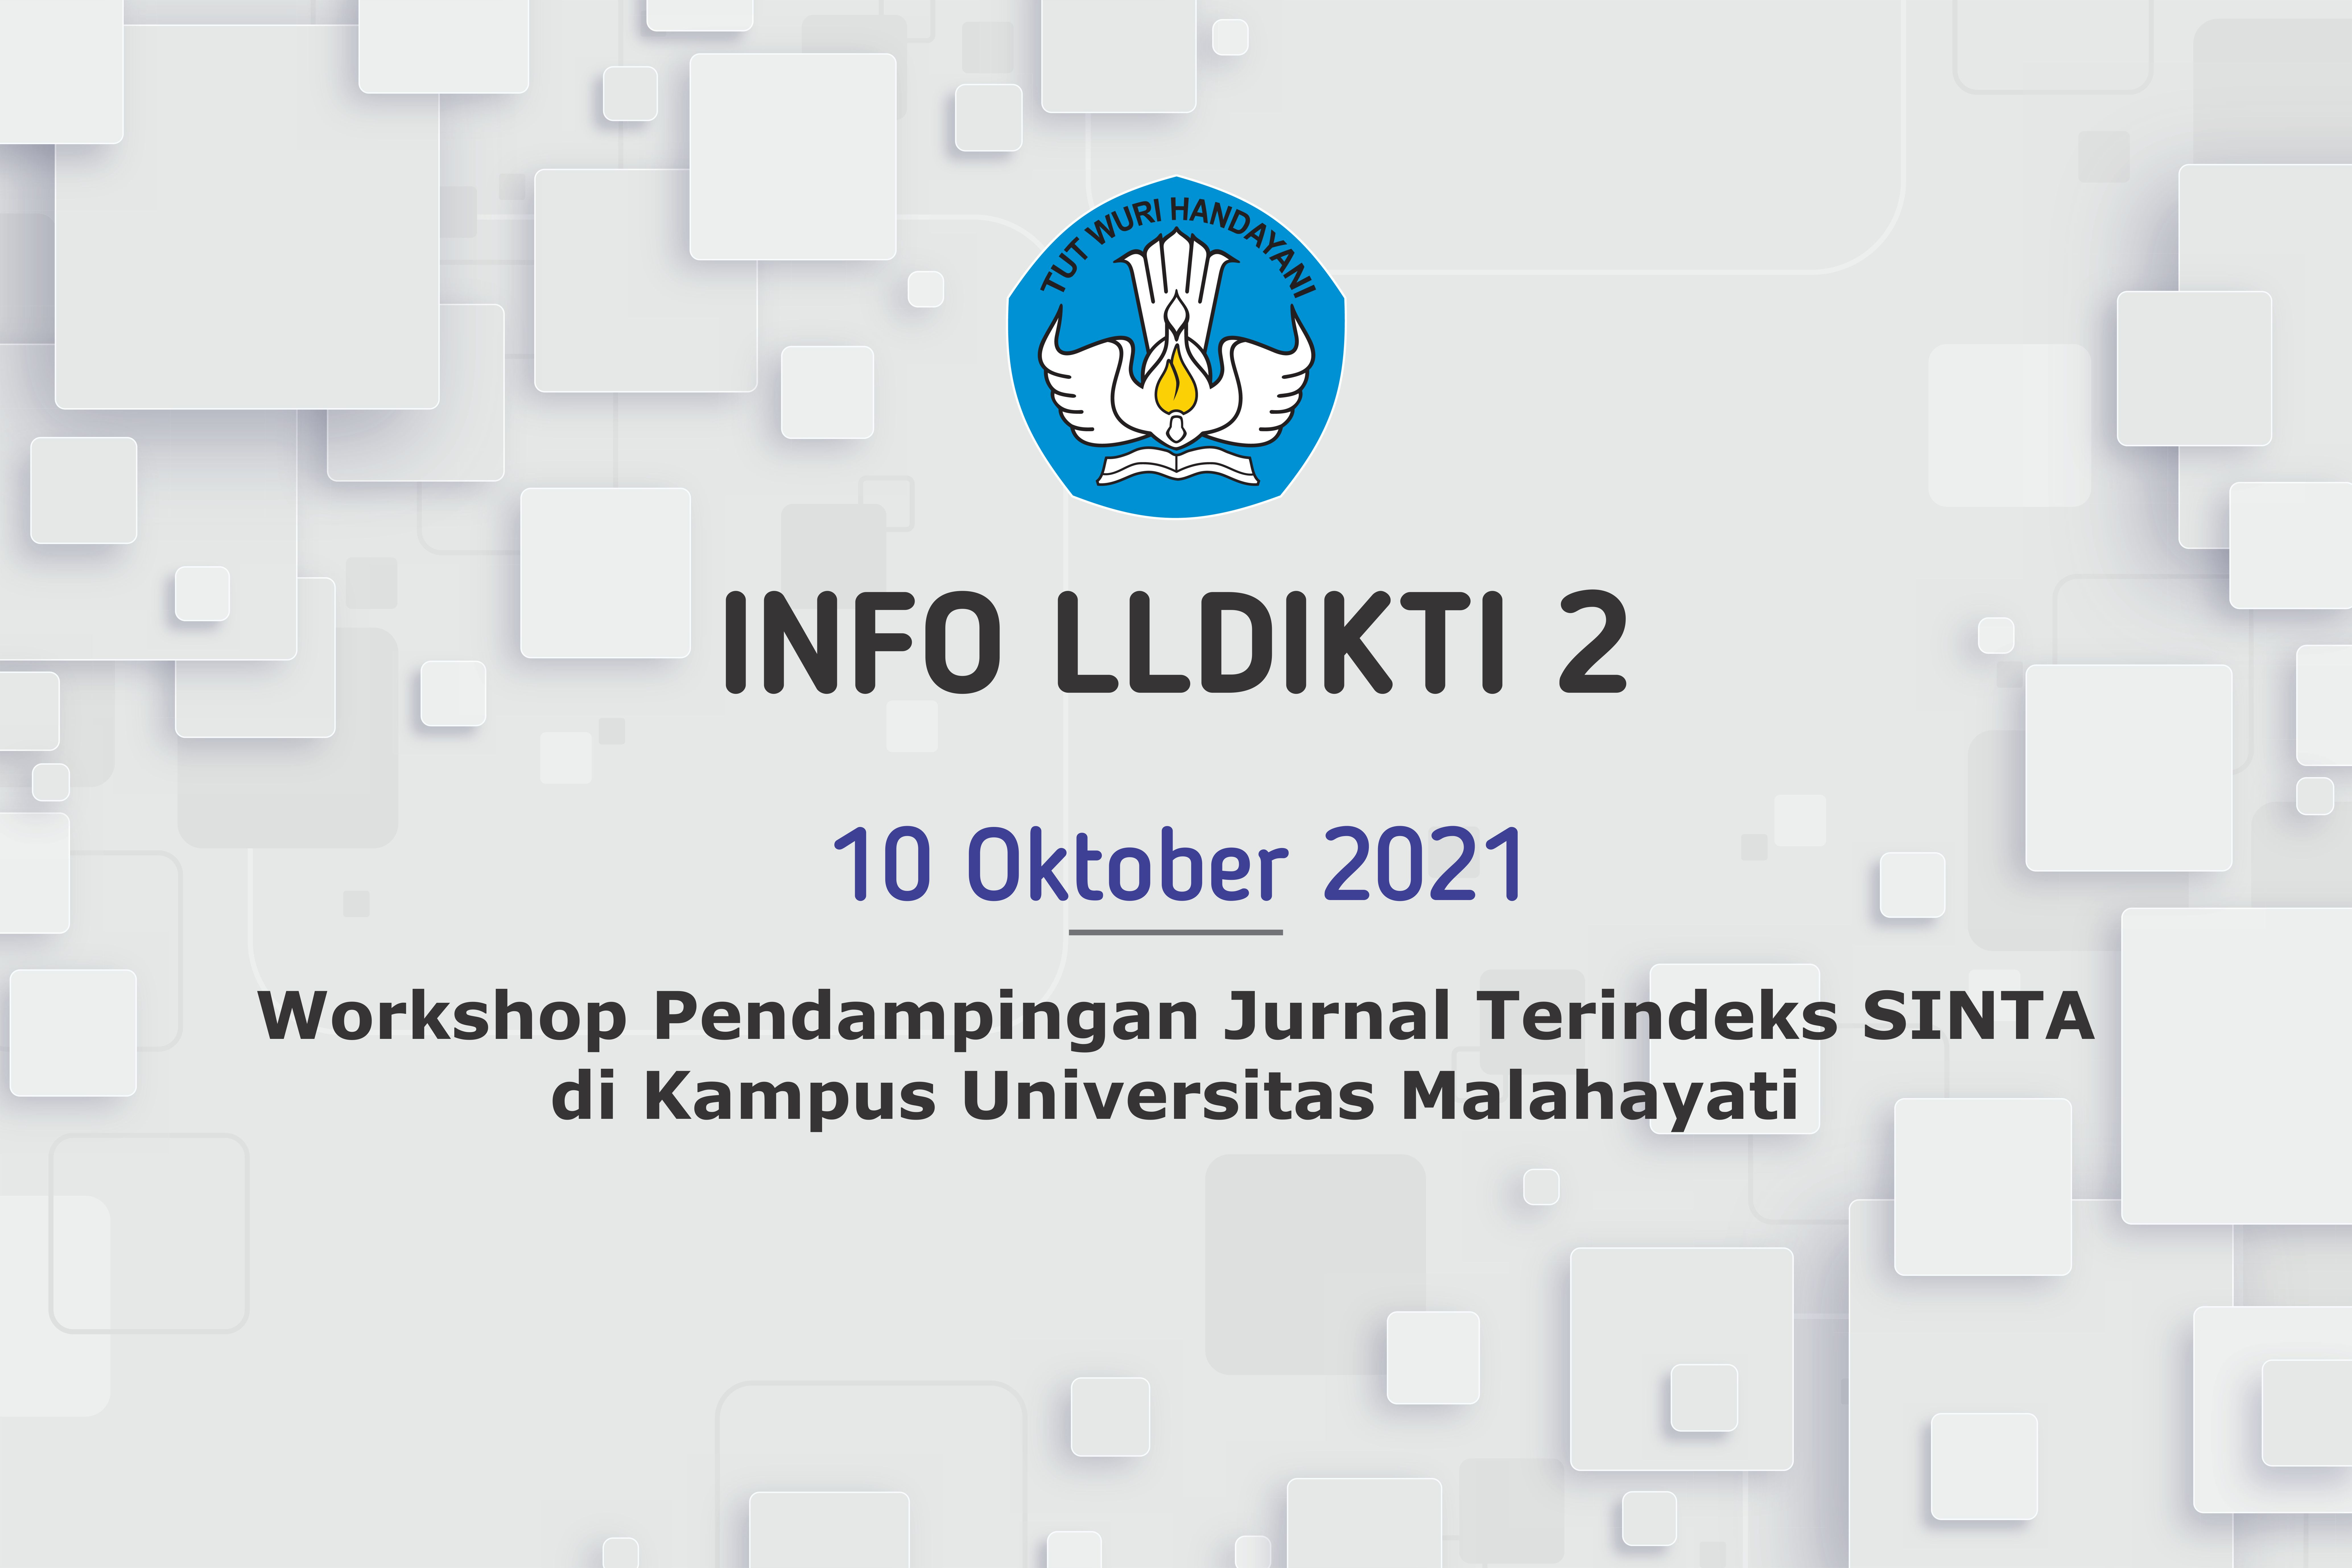 Workshop Pendampingan Jurnal Terindeks SINTA, Tanggal  11 s.d. 12 Oktober 2021